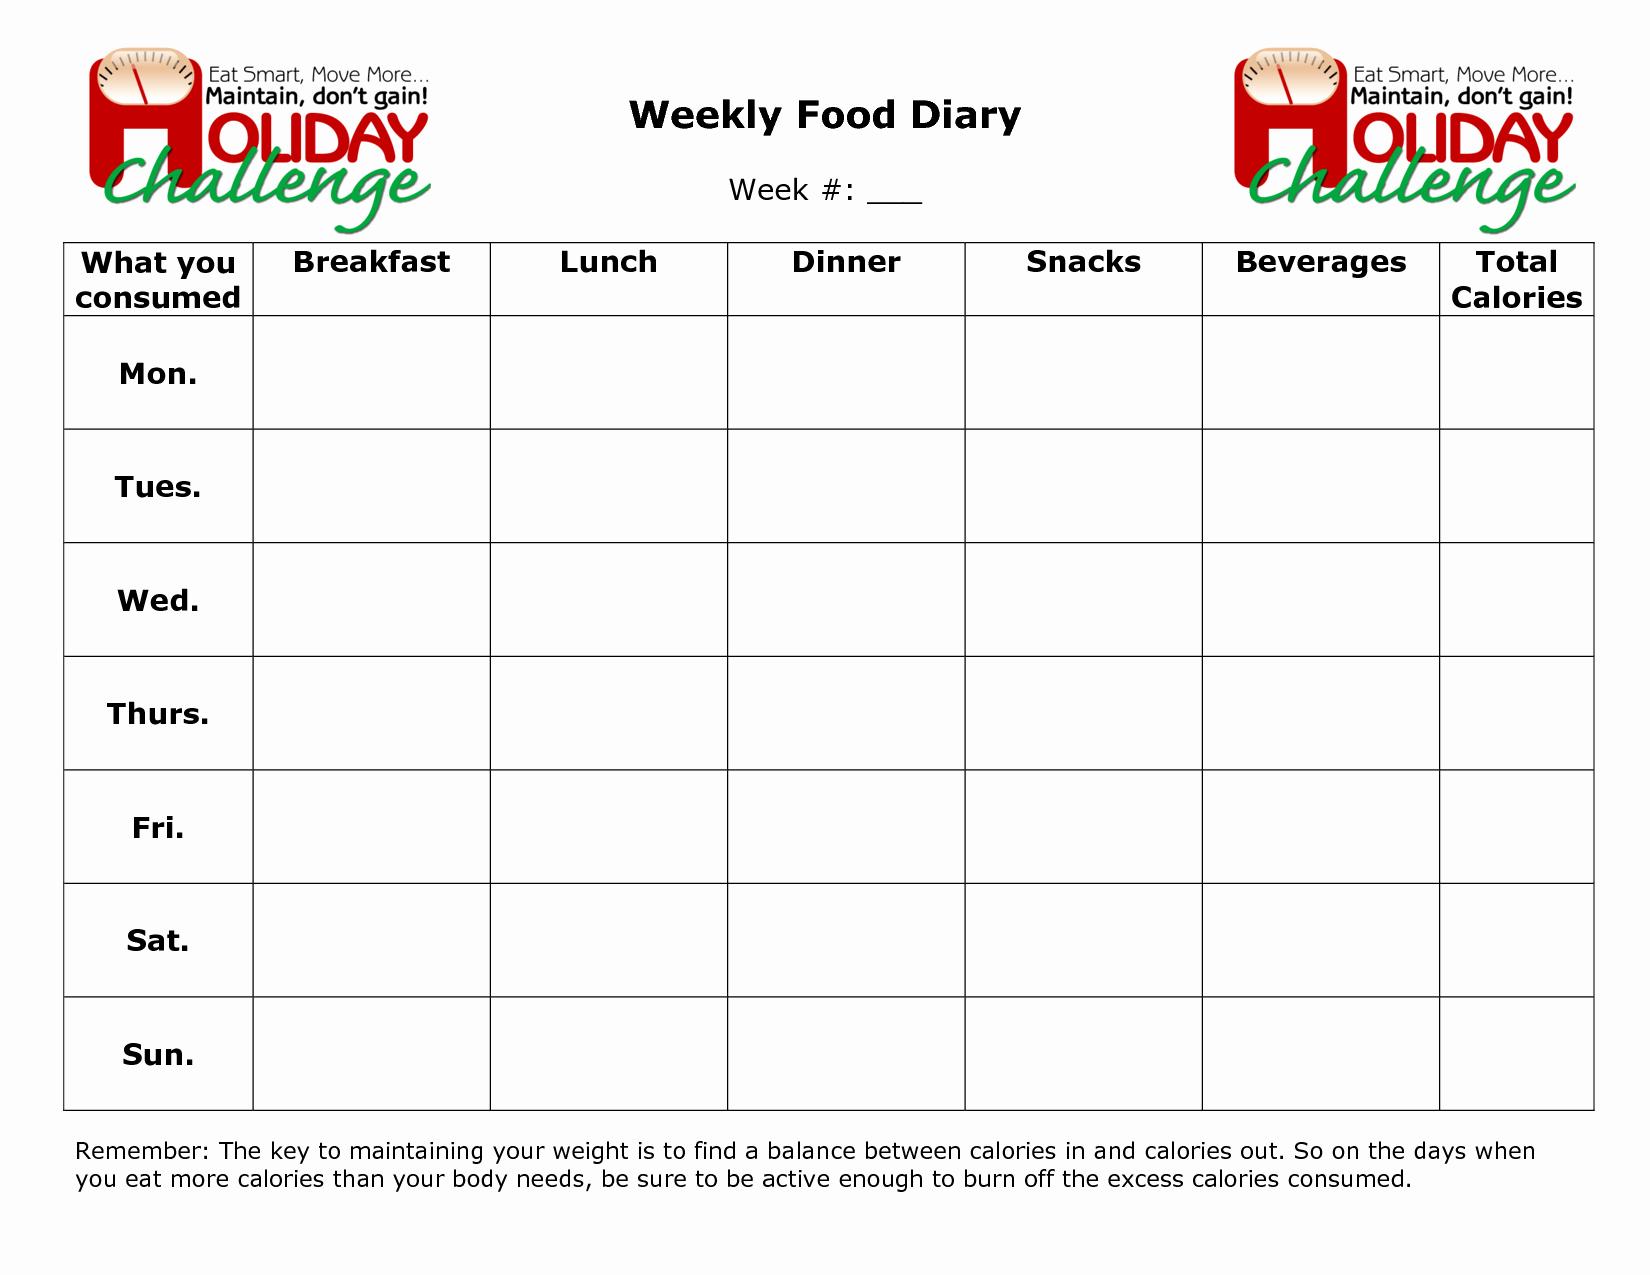 Food Log Template Excel Beautiful Best S Of Weekly Food Log Excel Weekly Food Diary